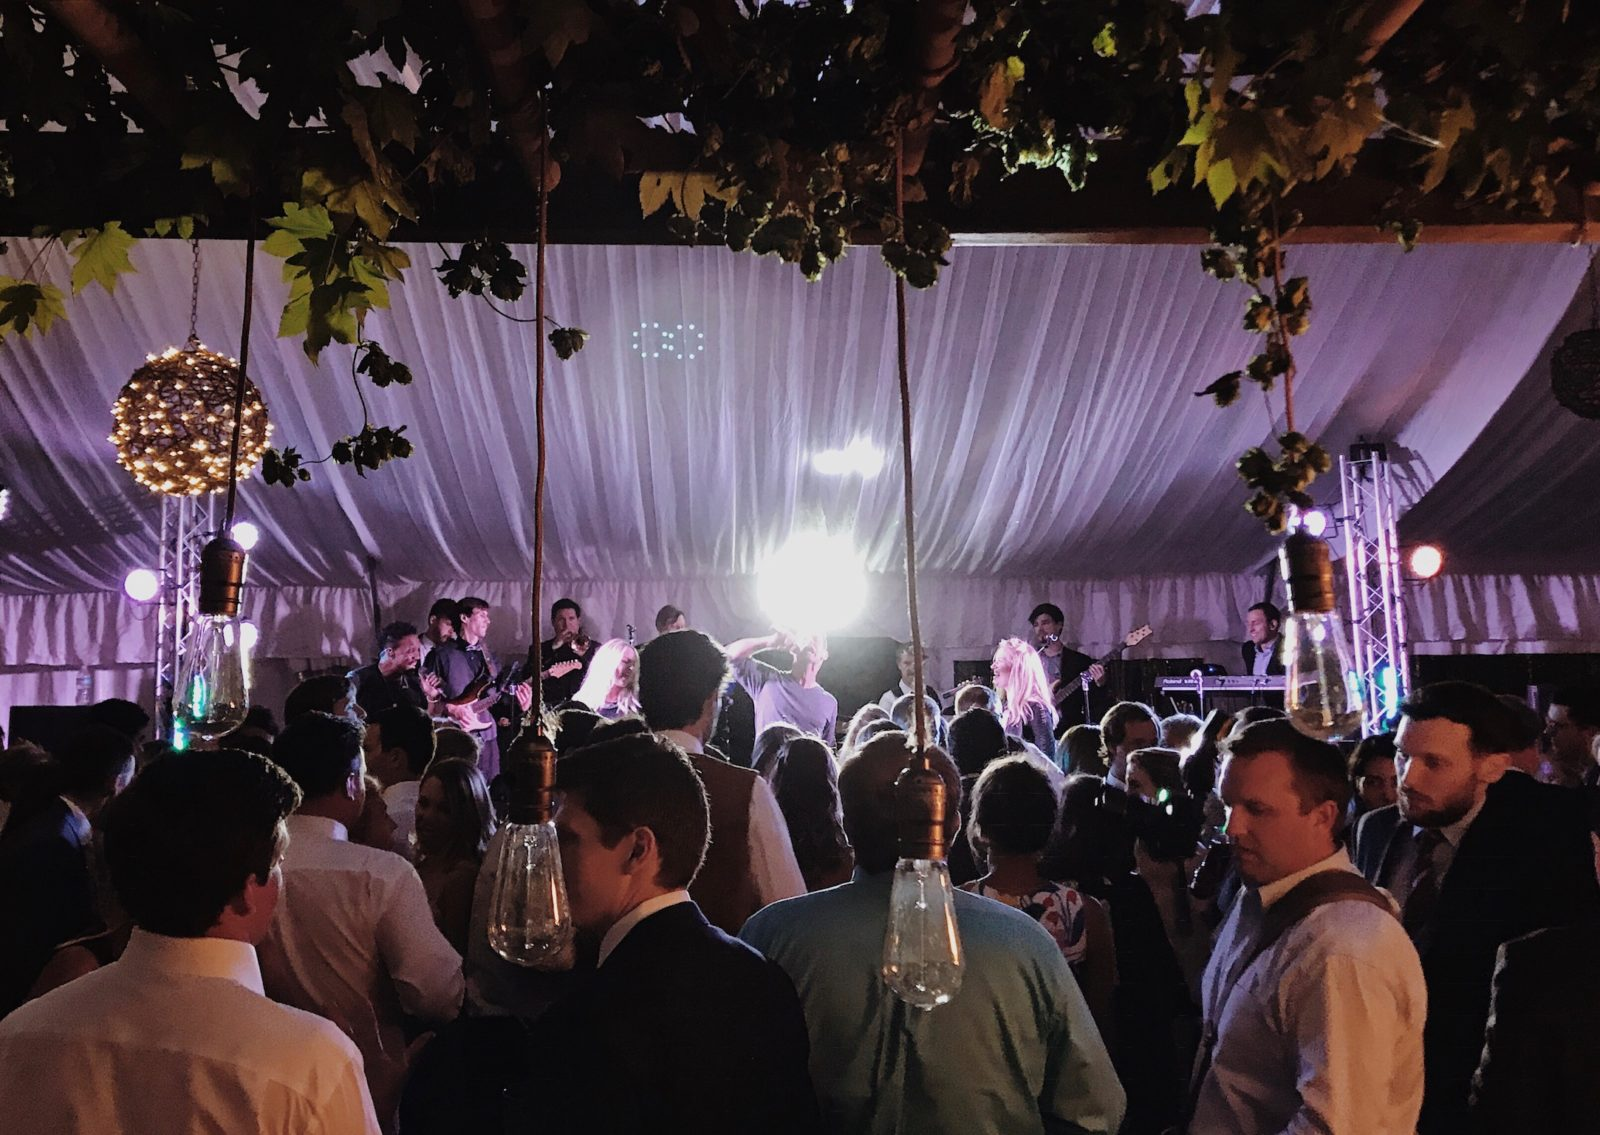 Colorado Wedding Band, Mannequin the Band, Aubrey Jacobs Okuchaba, Kenton Kennedy, Dana Wield, Alan Currens